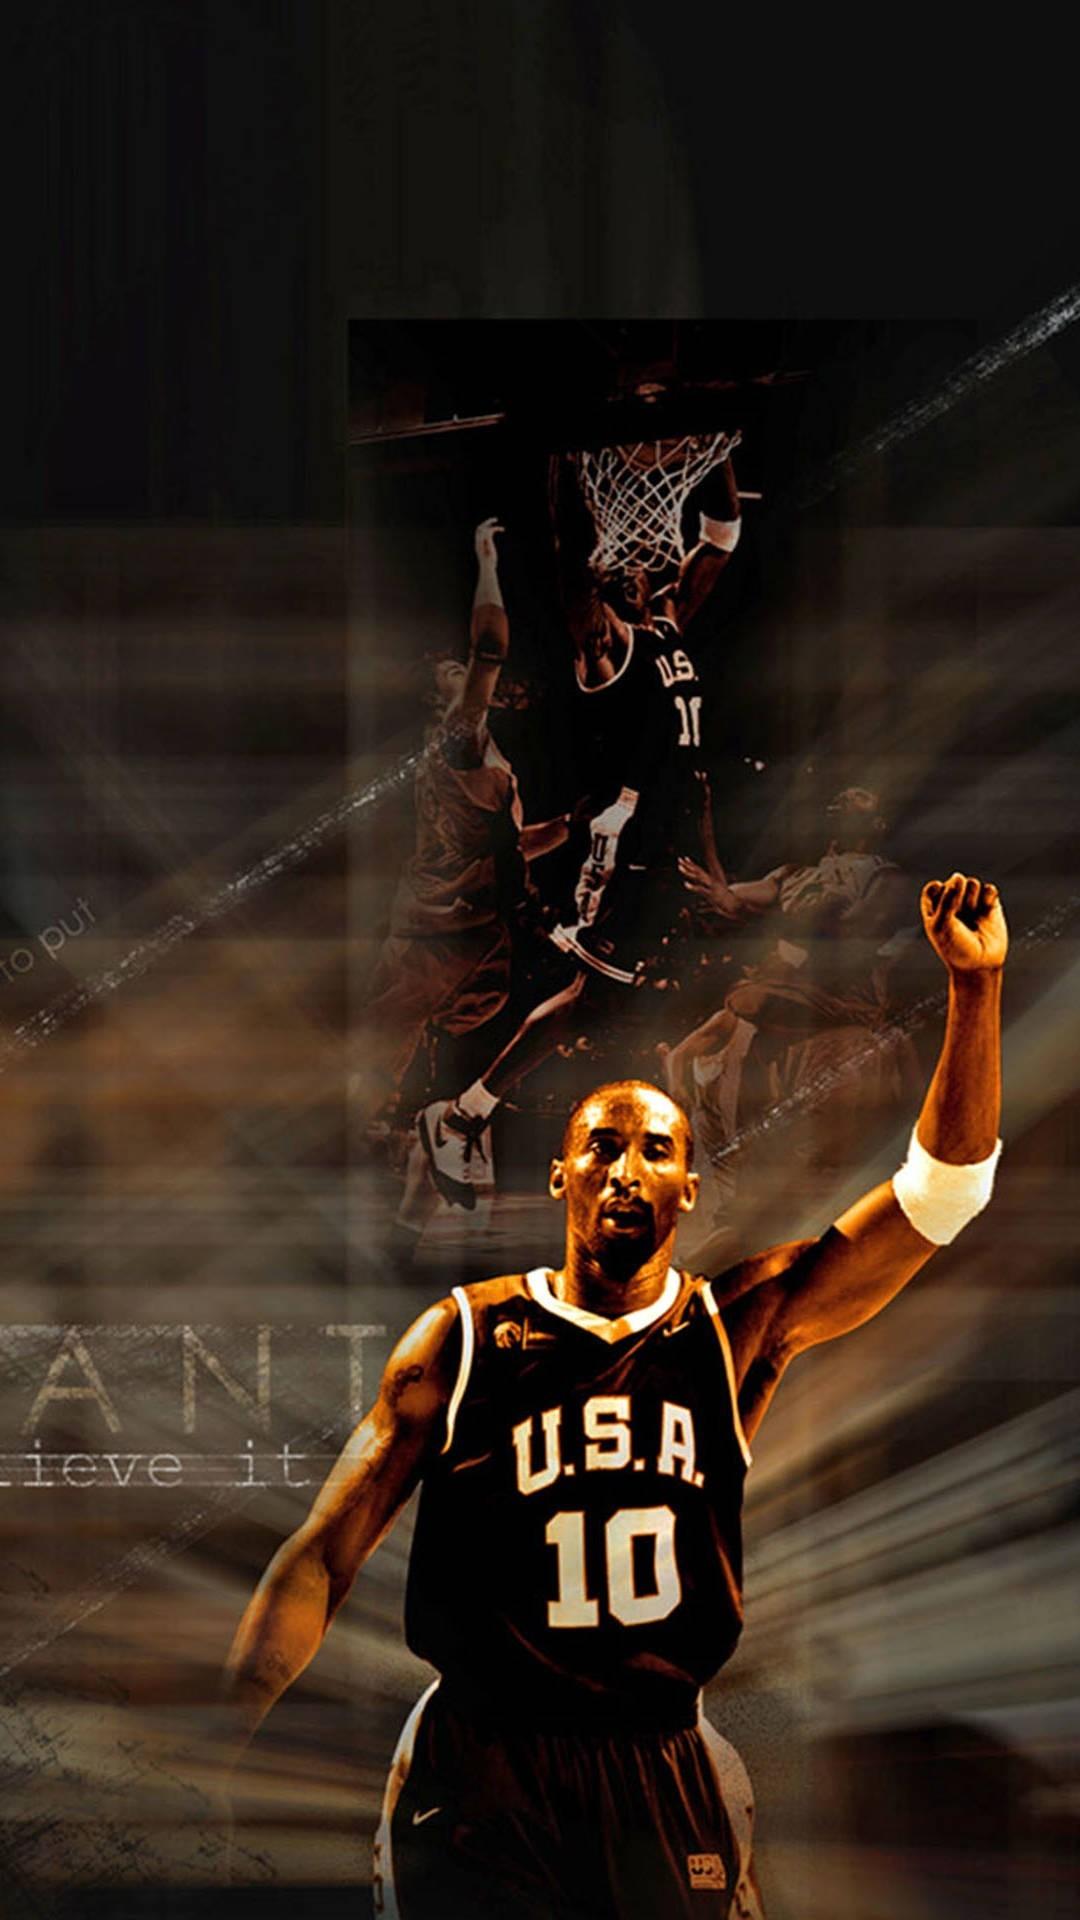 Kobe Bryant iPhone Wallpaper Basketball